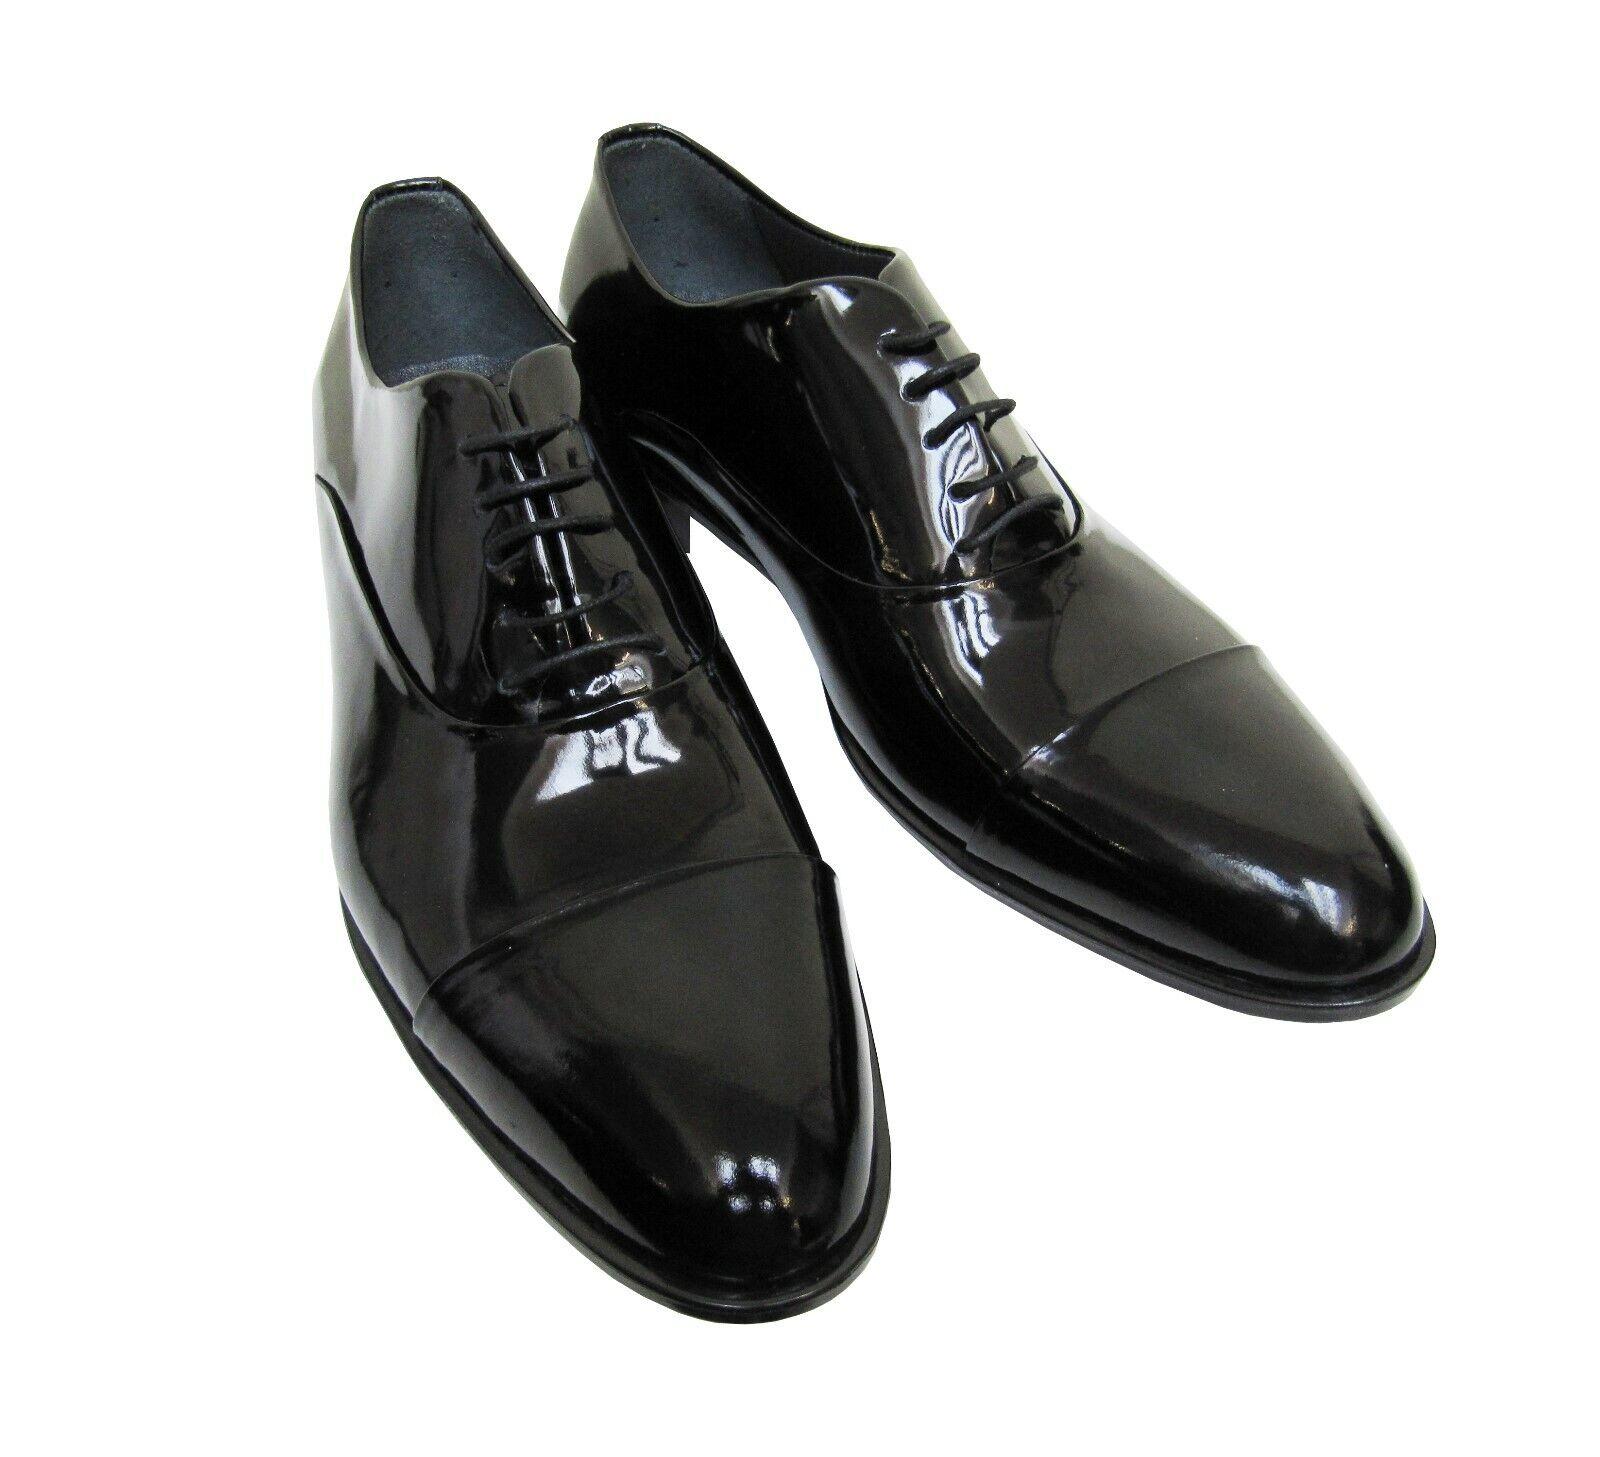 Herren Schuhe Echtleder Lack Gr.42 schwarz glänzend